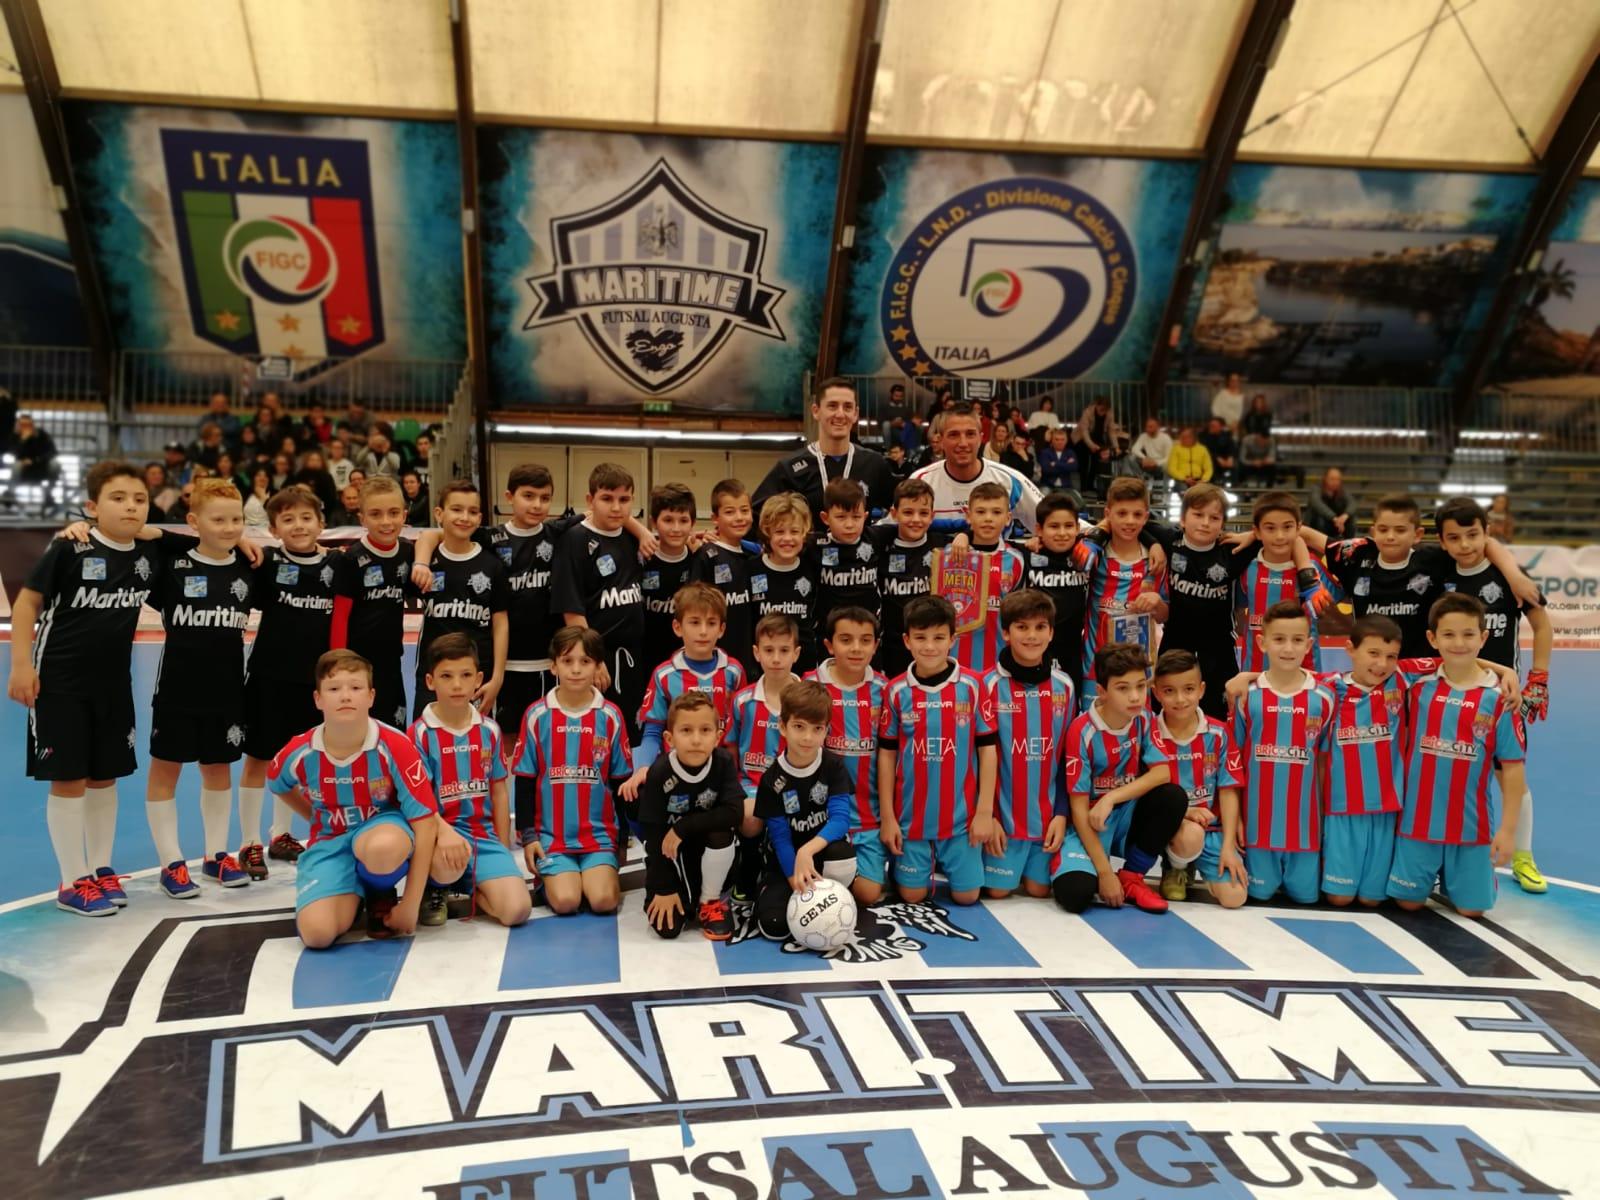 Grande giornata di sport tra Meta Catania e Maritime